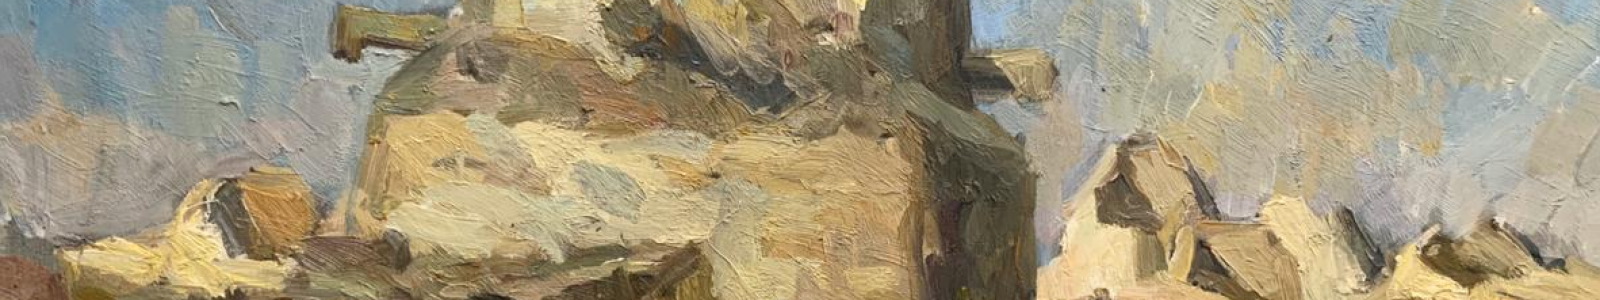 Gallery Painter Mariyam Alibay